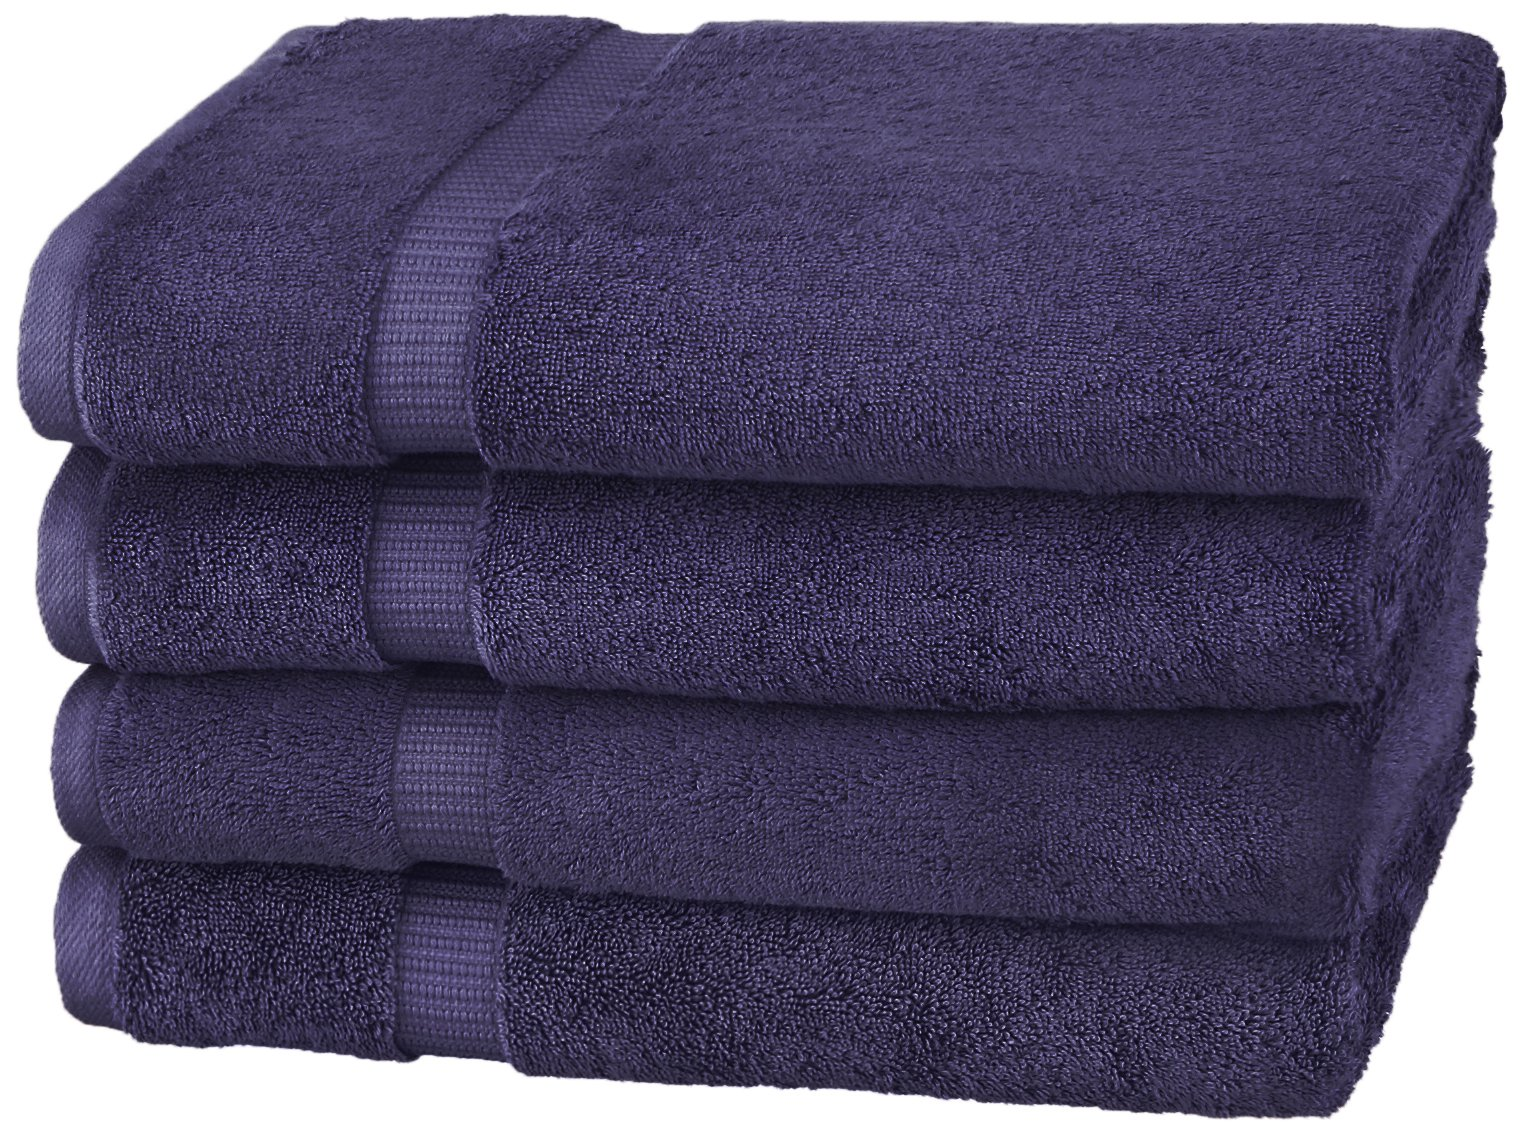 Pinzon Organic Cotton Bath Towels (4 Pack), Navy